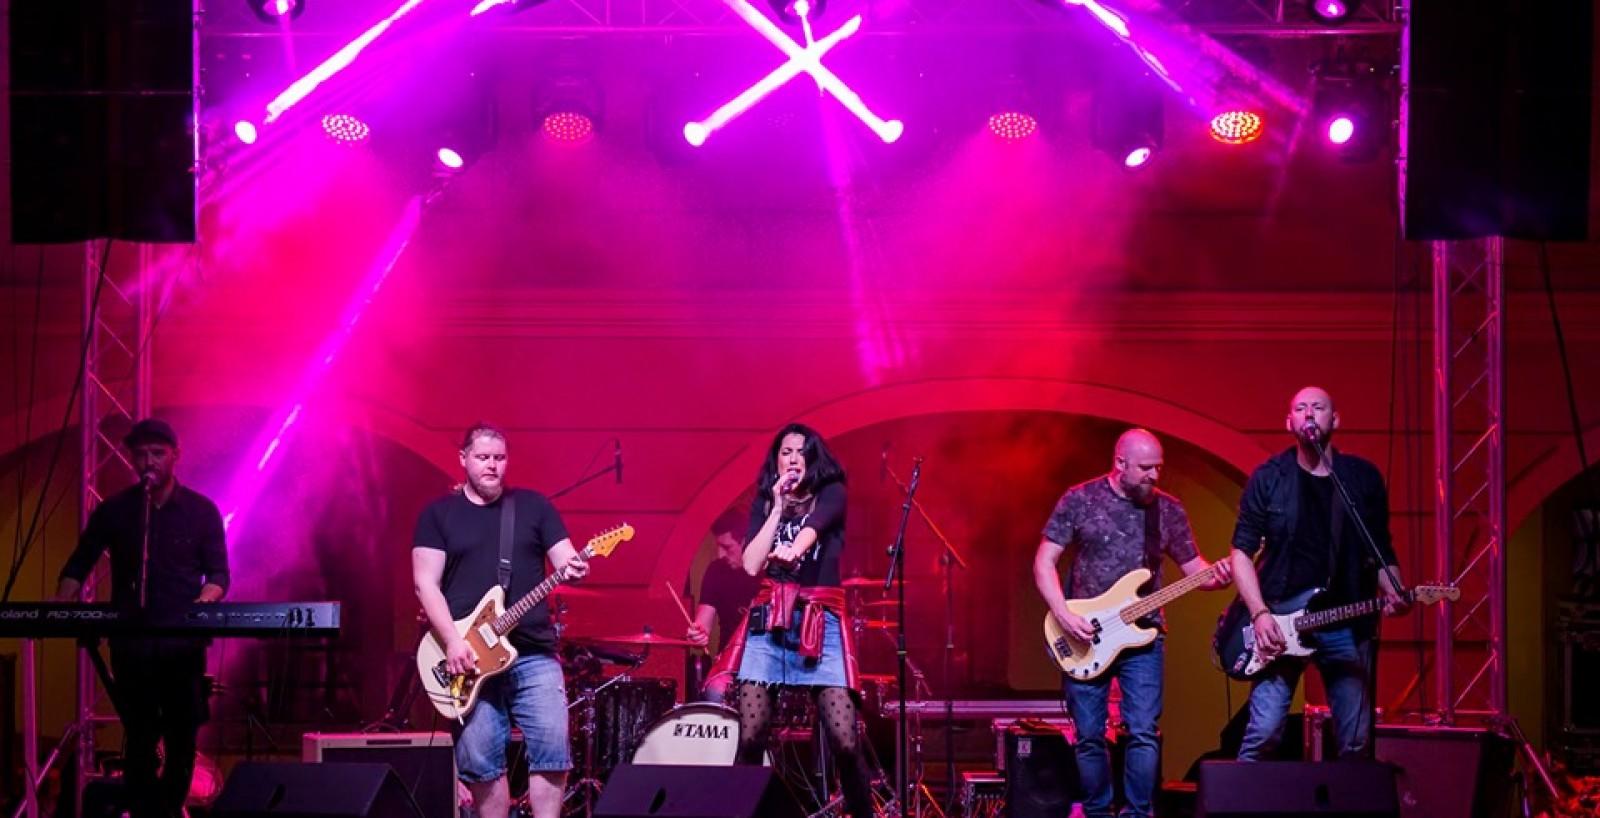 6. VG FEST obilježile brojne radionice, koncerti i dobra zabava u centru grada